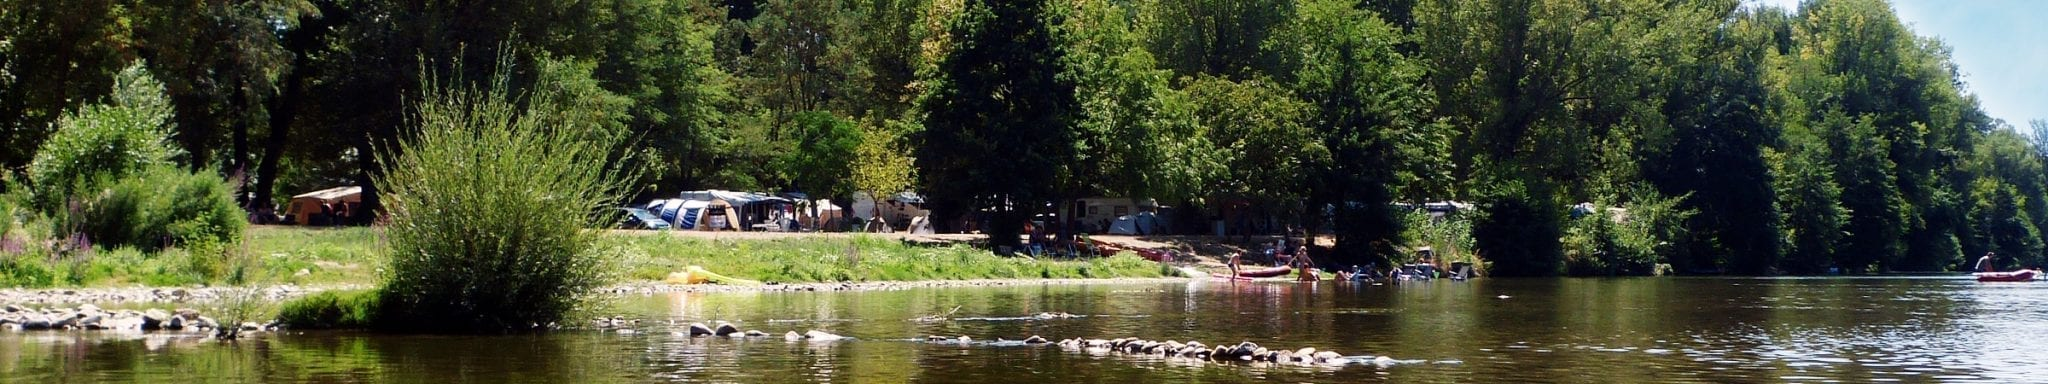 riviere le Gardon camping Beau Rivage